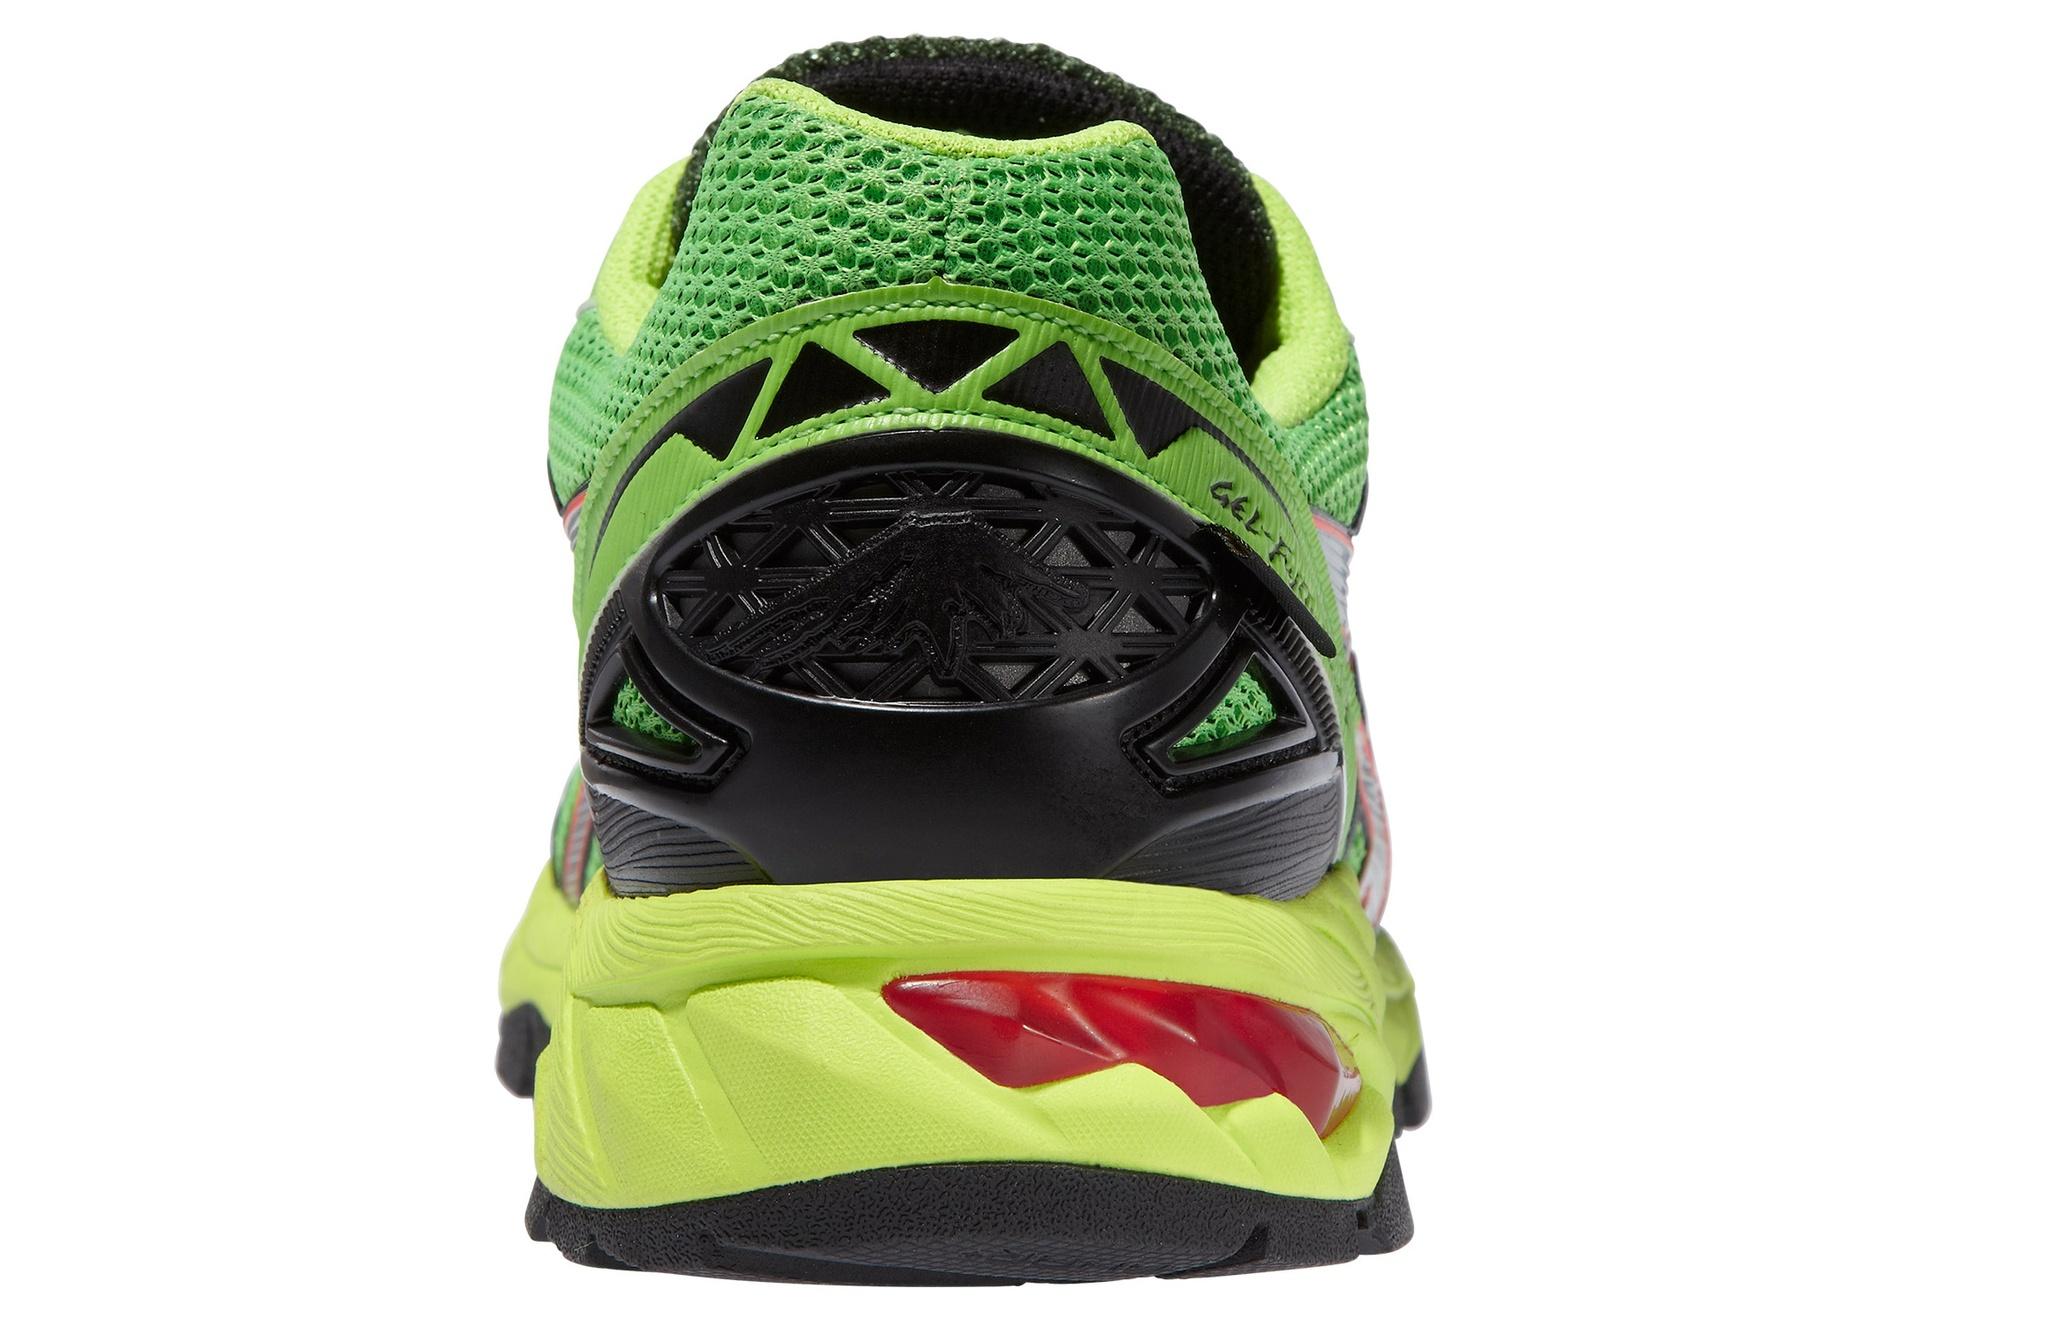 Мужские беговые кроссовки внедорожники Asics Gel-Fujitrabuco 3 G-TX (T4E3N 8593) фото